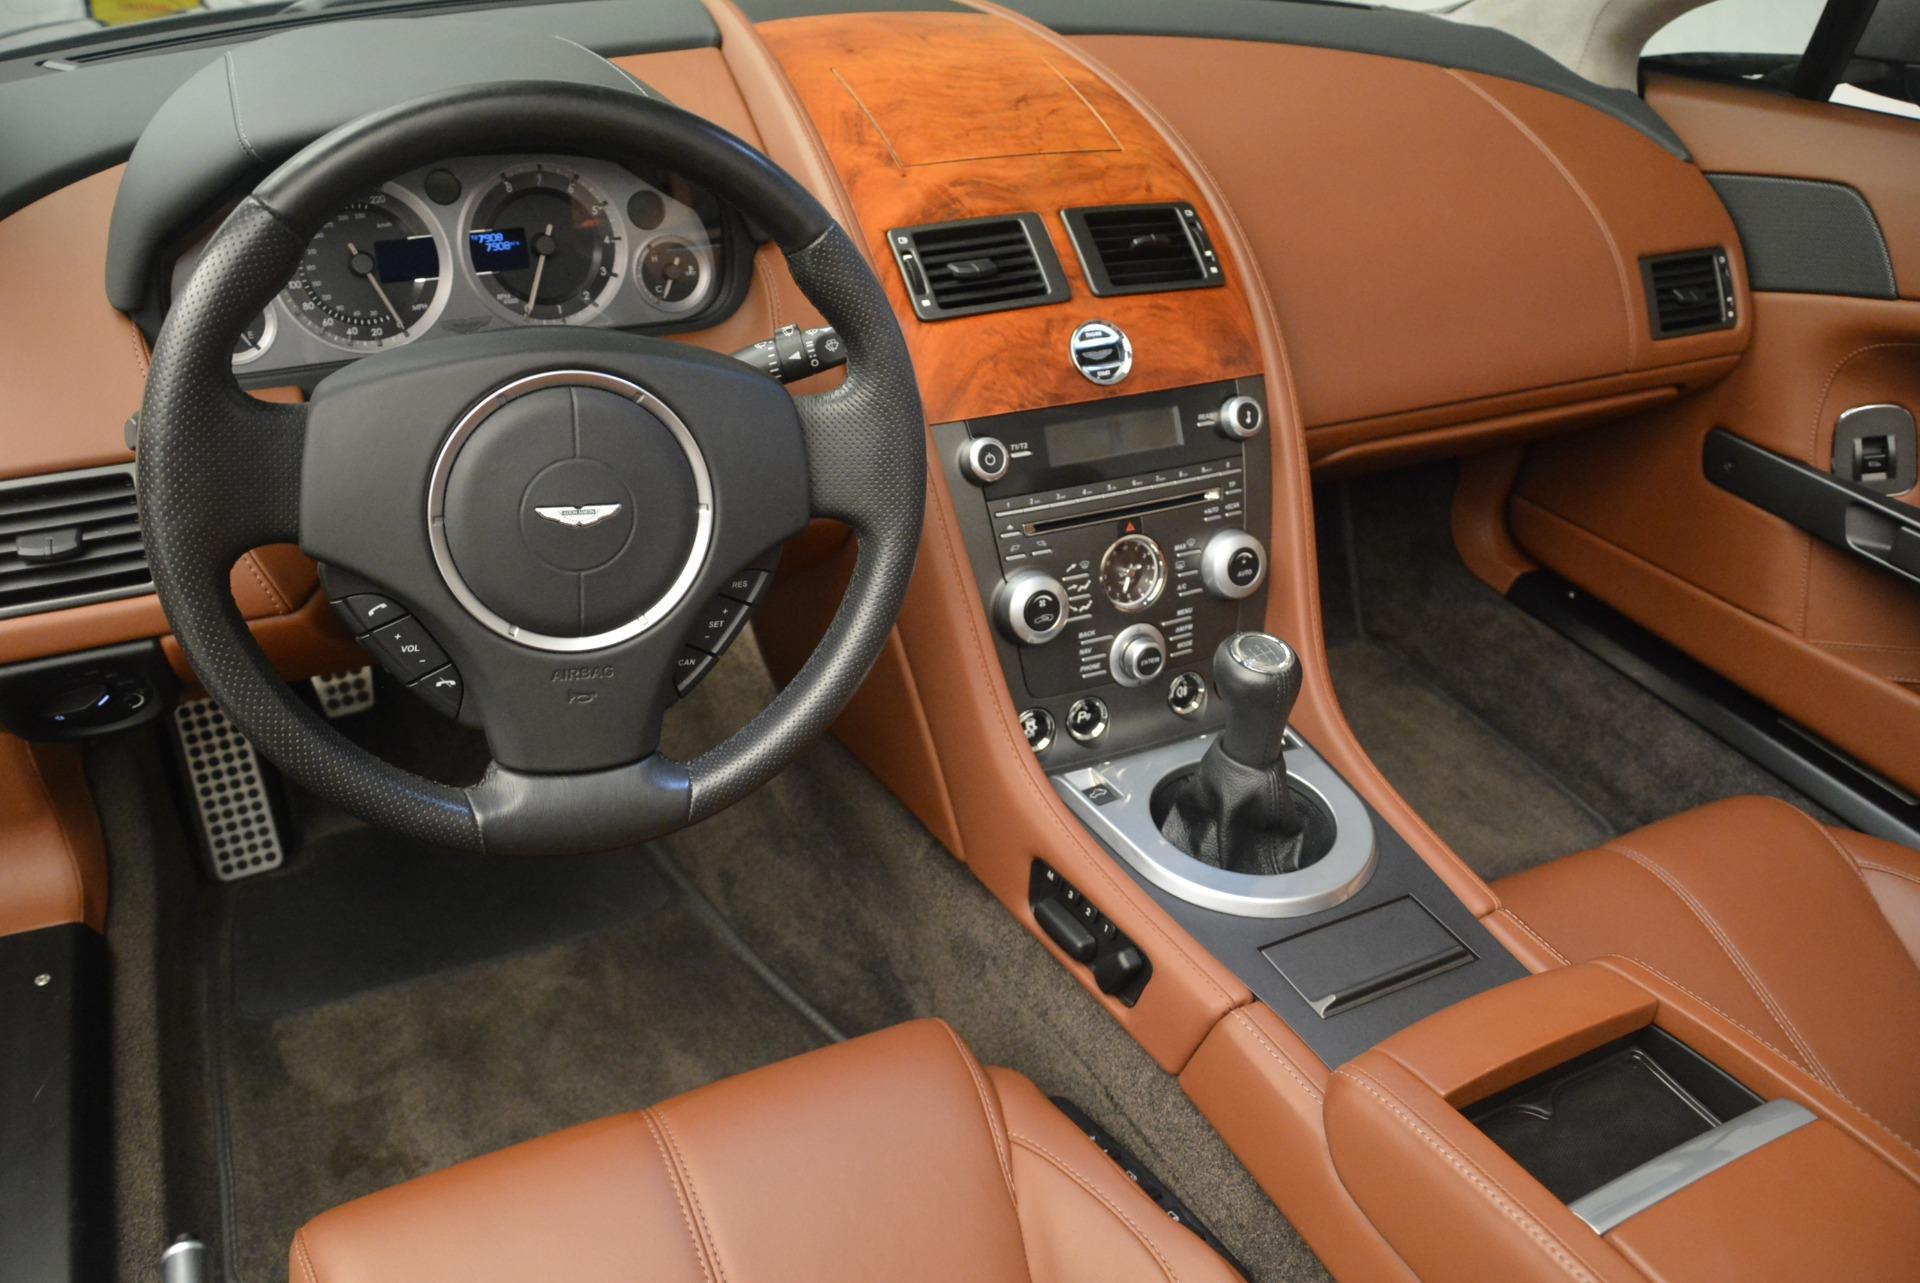 Used 2015 Aston Martin V8 Vantage Roadster For Sale In Greenwich, CT. Alfa Romeo of Greenwich, 7396 2463_p20